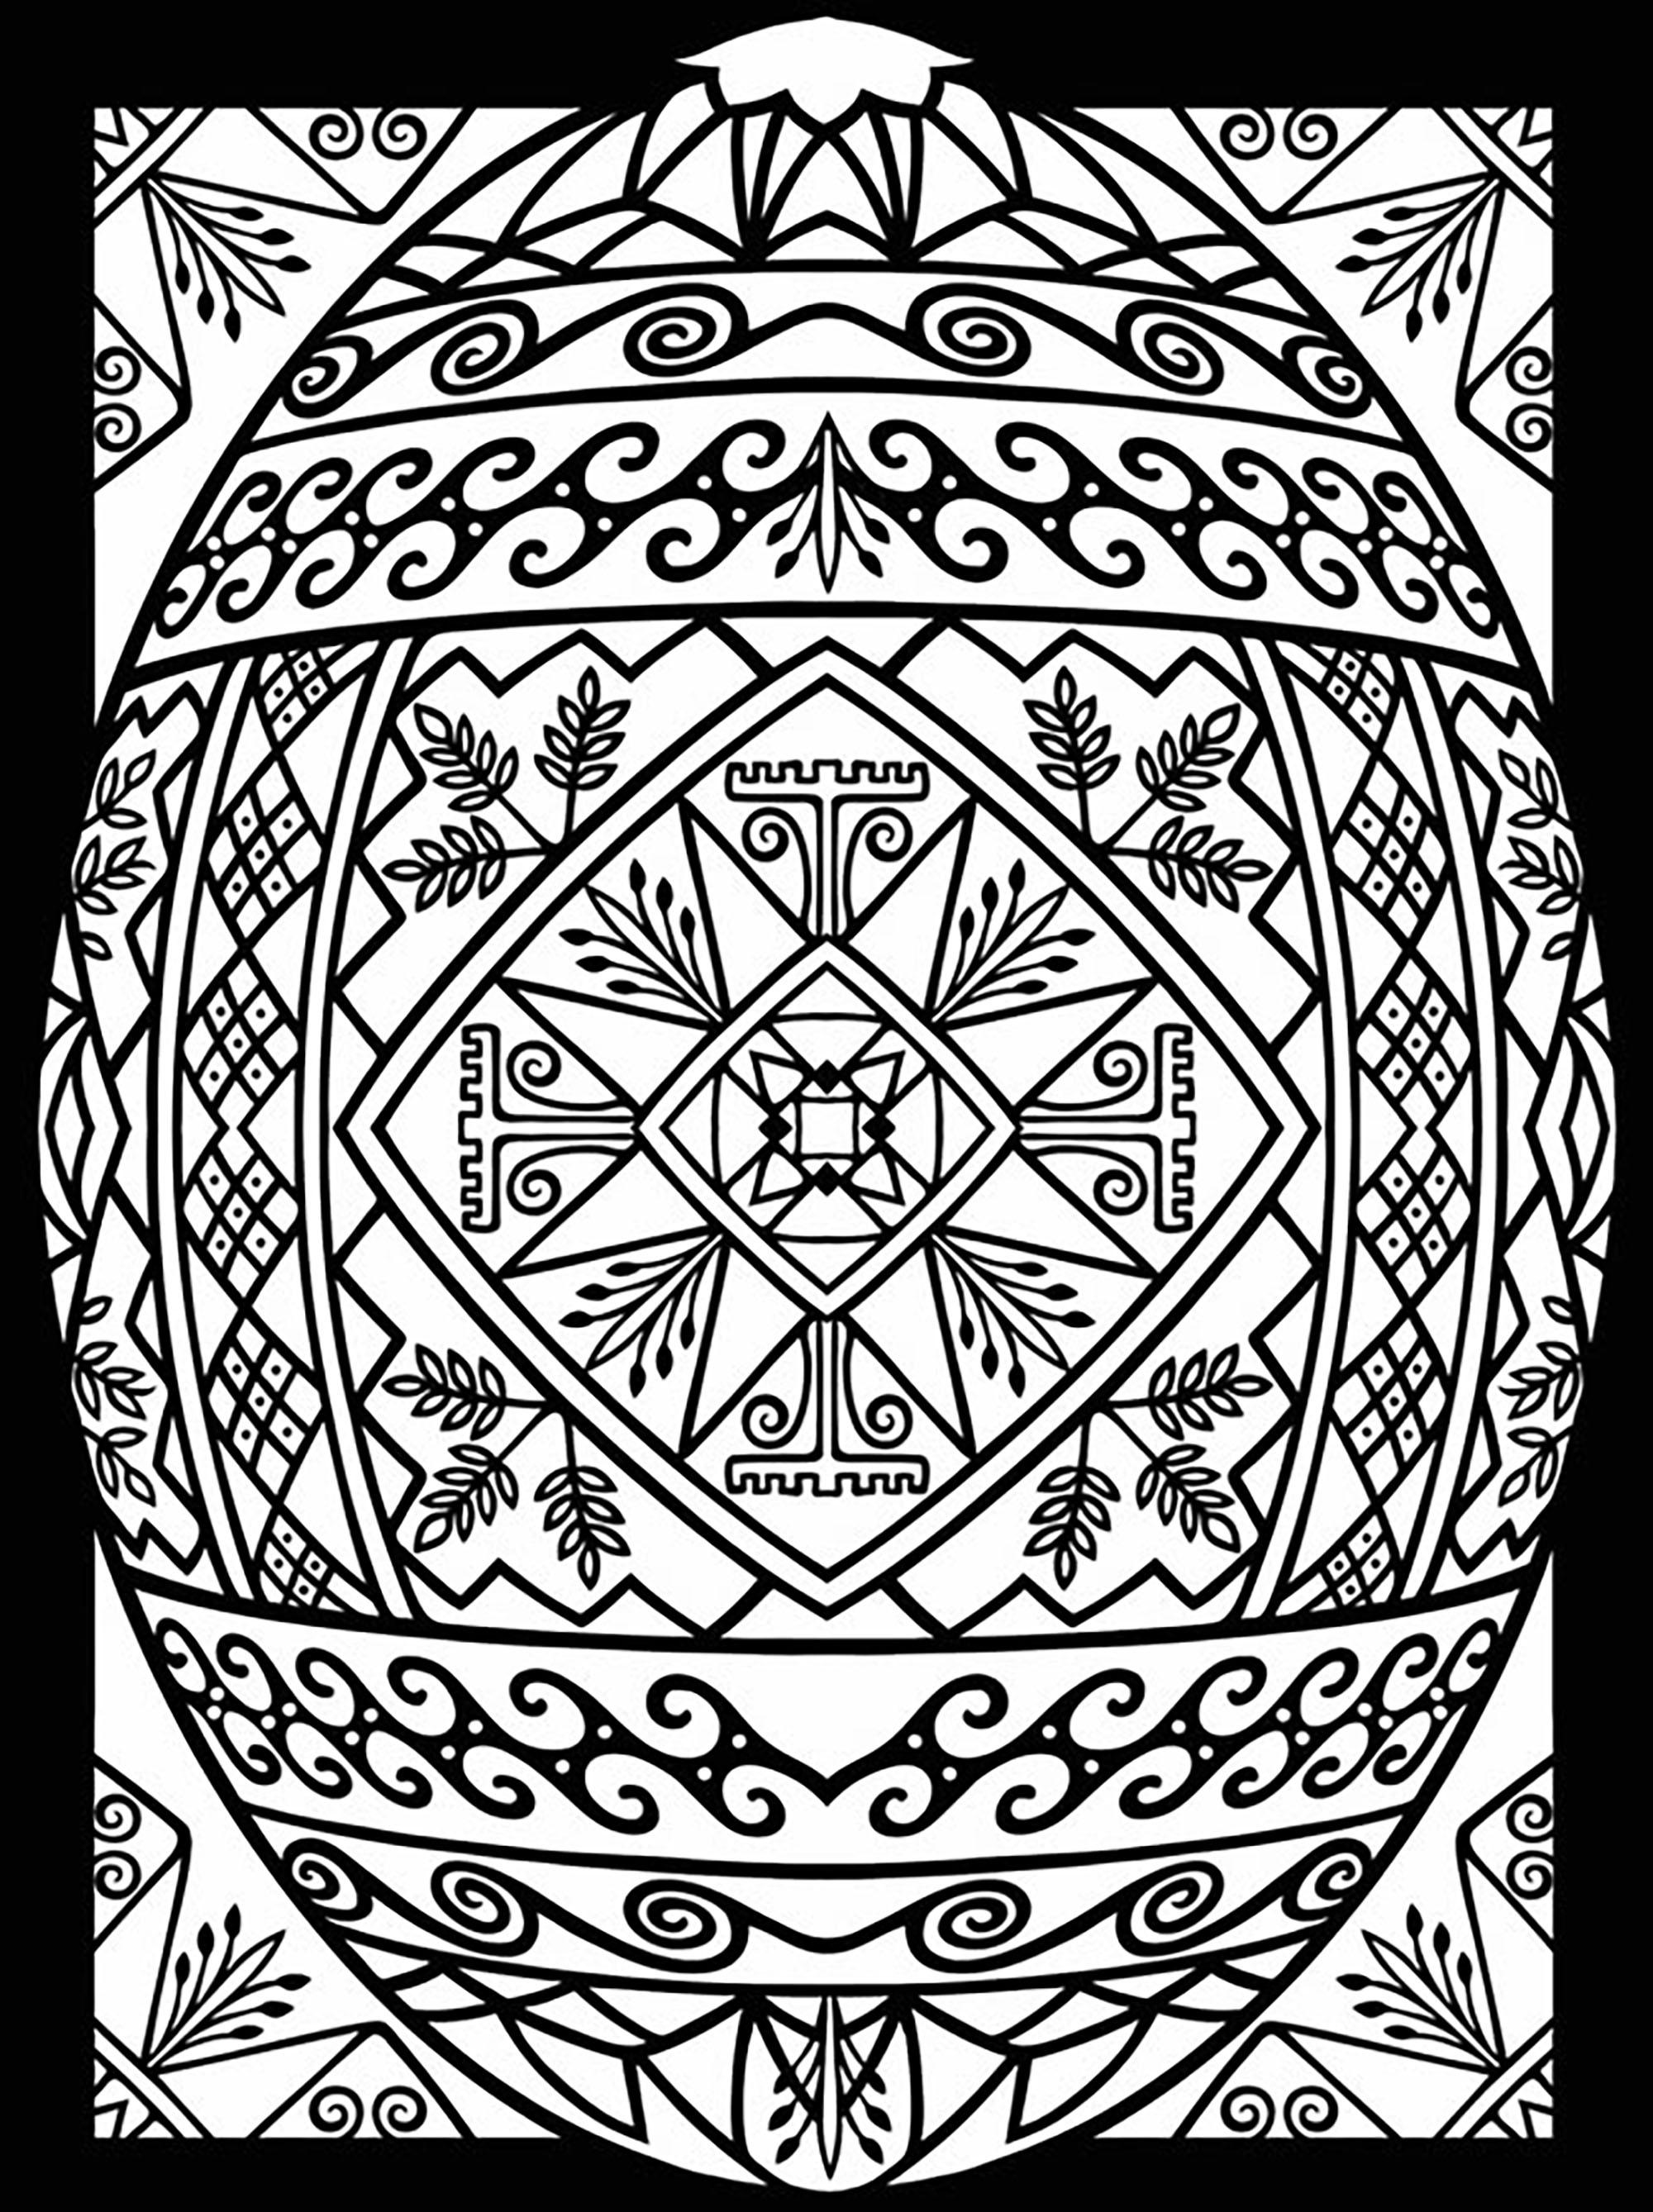 Colorear para adultos : Pascua de Resurrección - 1